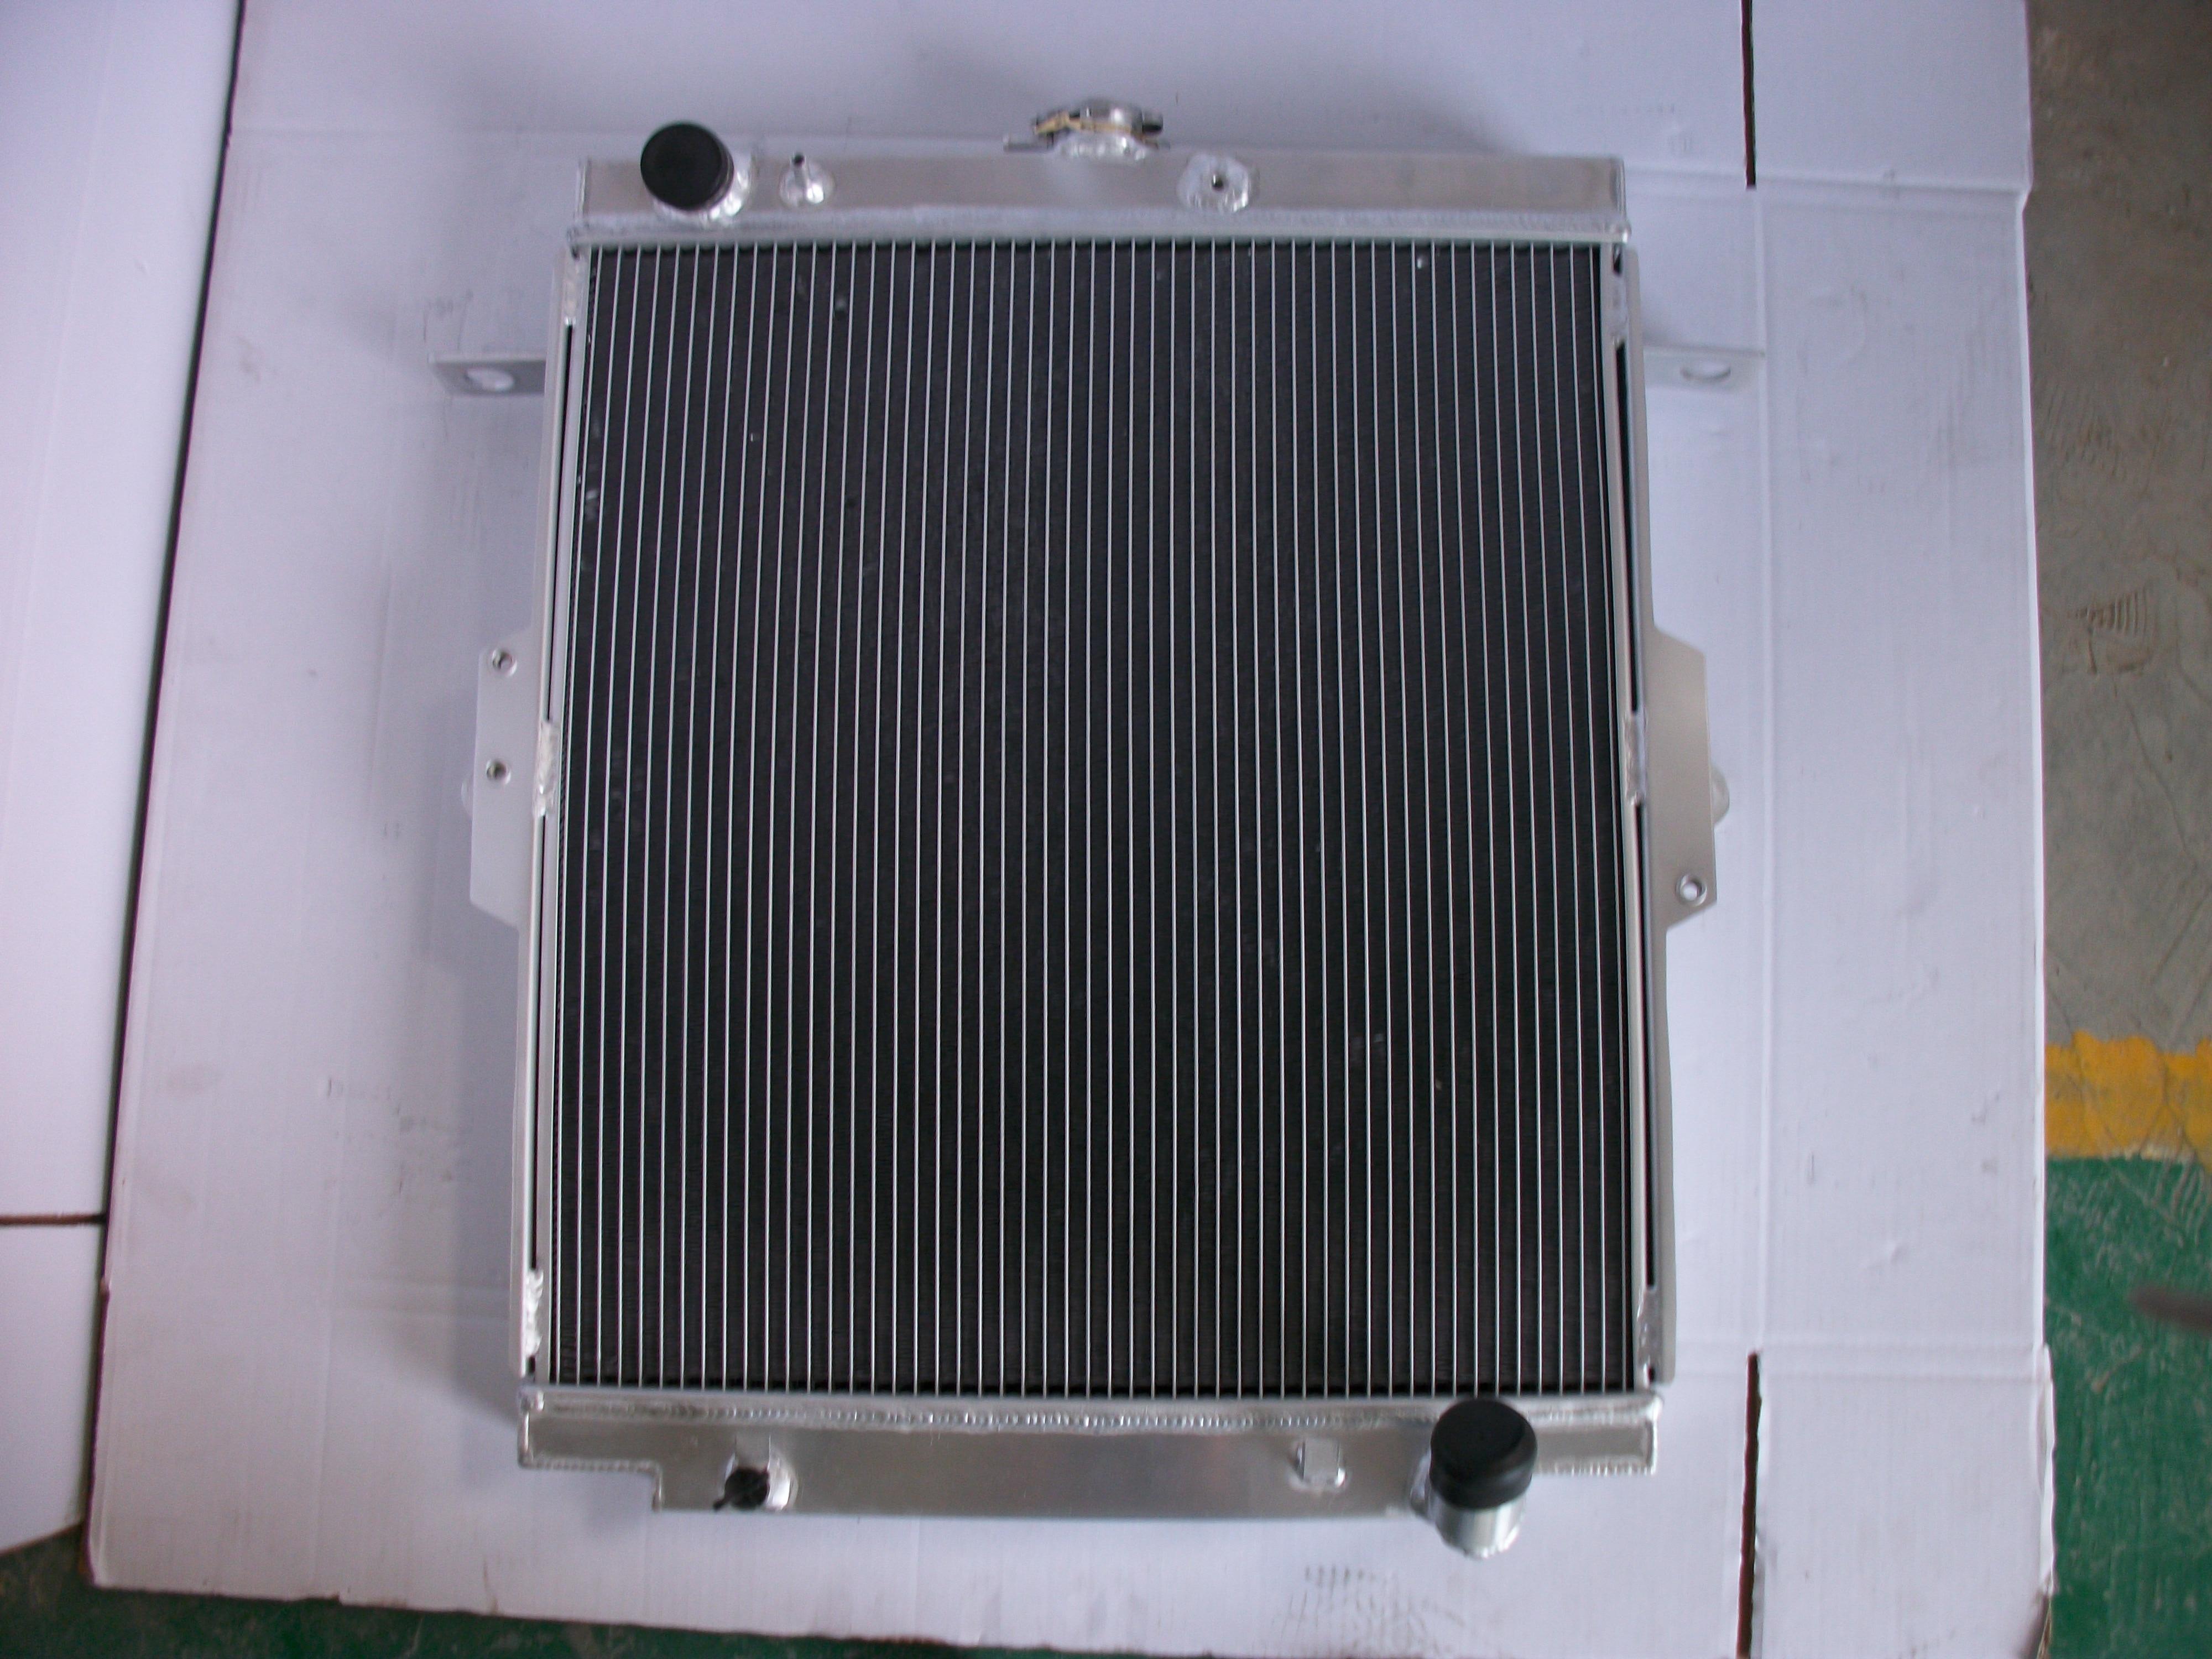 Nuevo radiador de aluminio para Toyota LandCruiser Land Cruiser HDJ81 MT